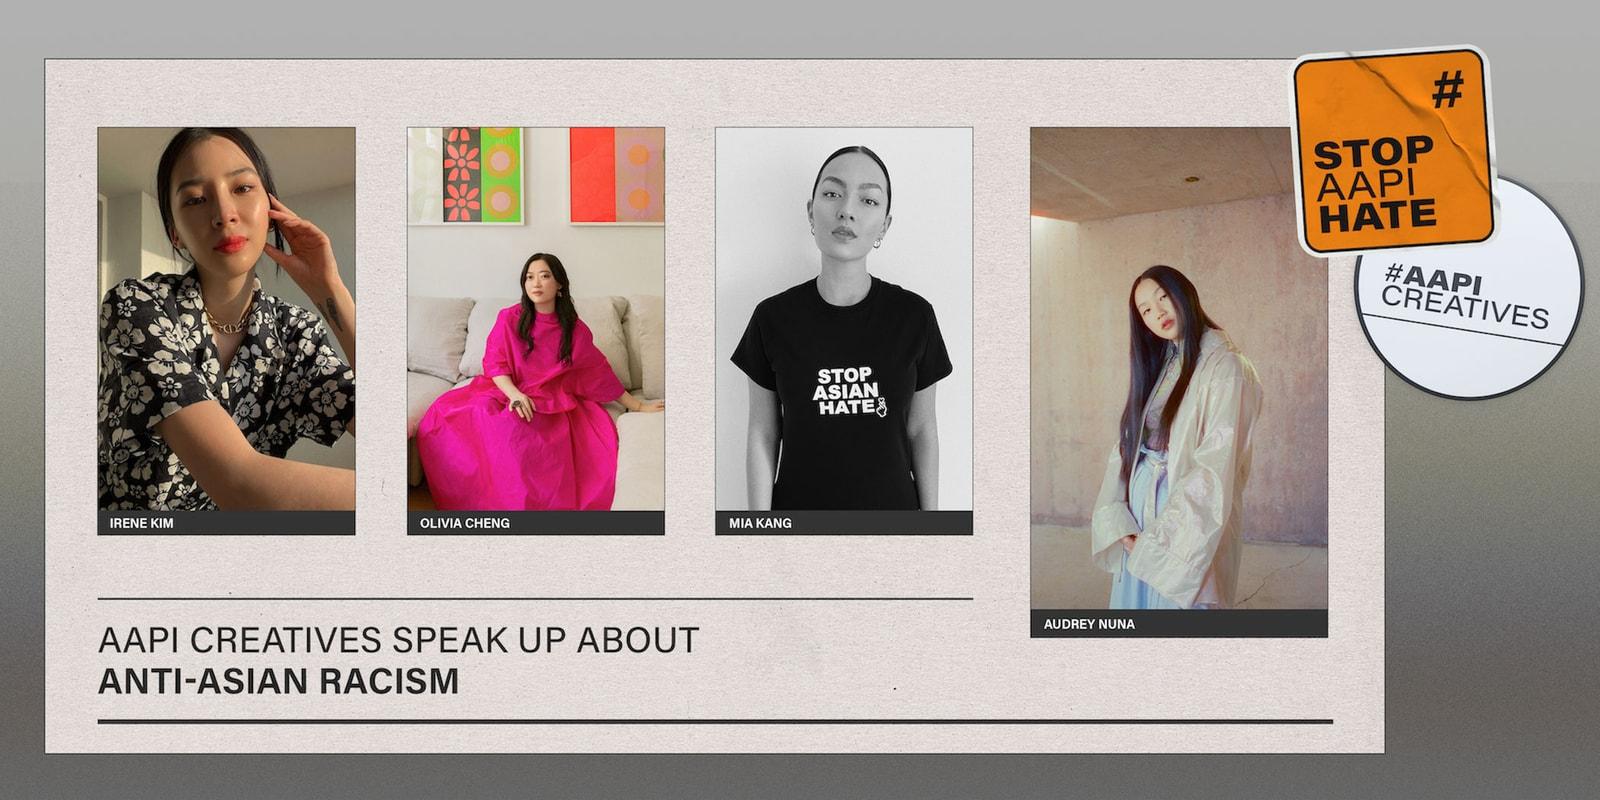 aapi asian pacific american heritage month fashion music industry racism irene kim mia kang audrey nuna